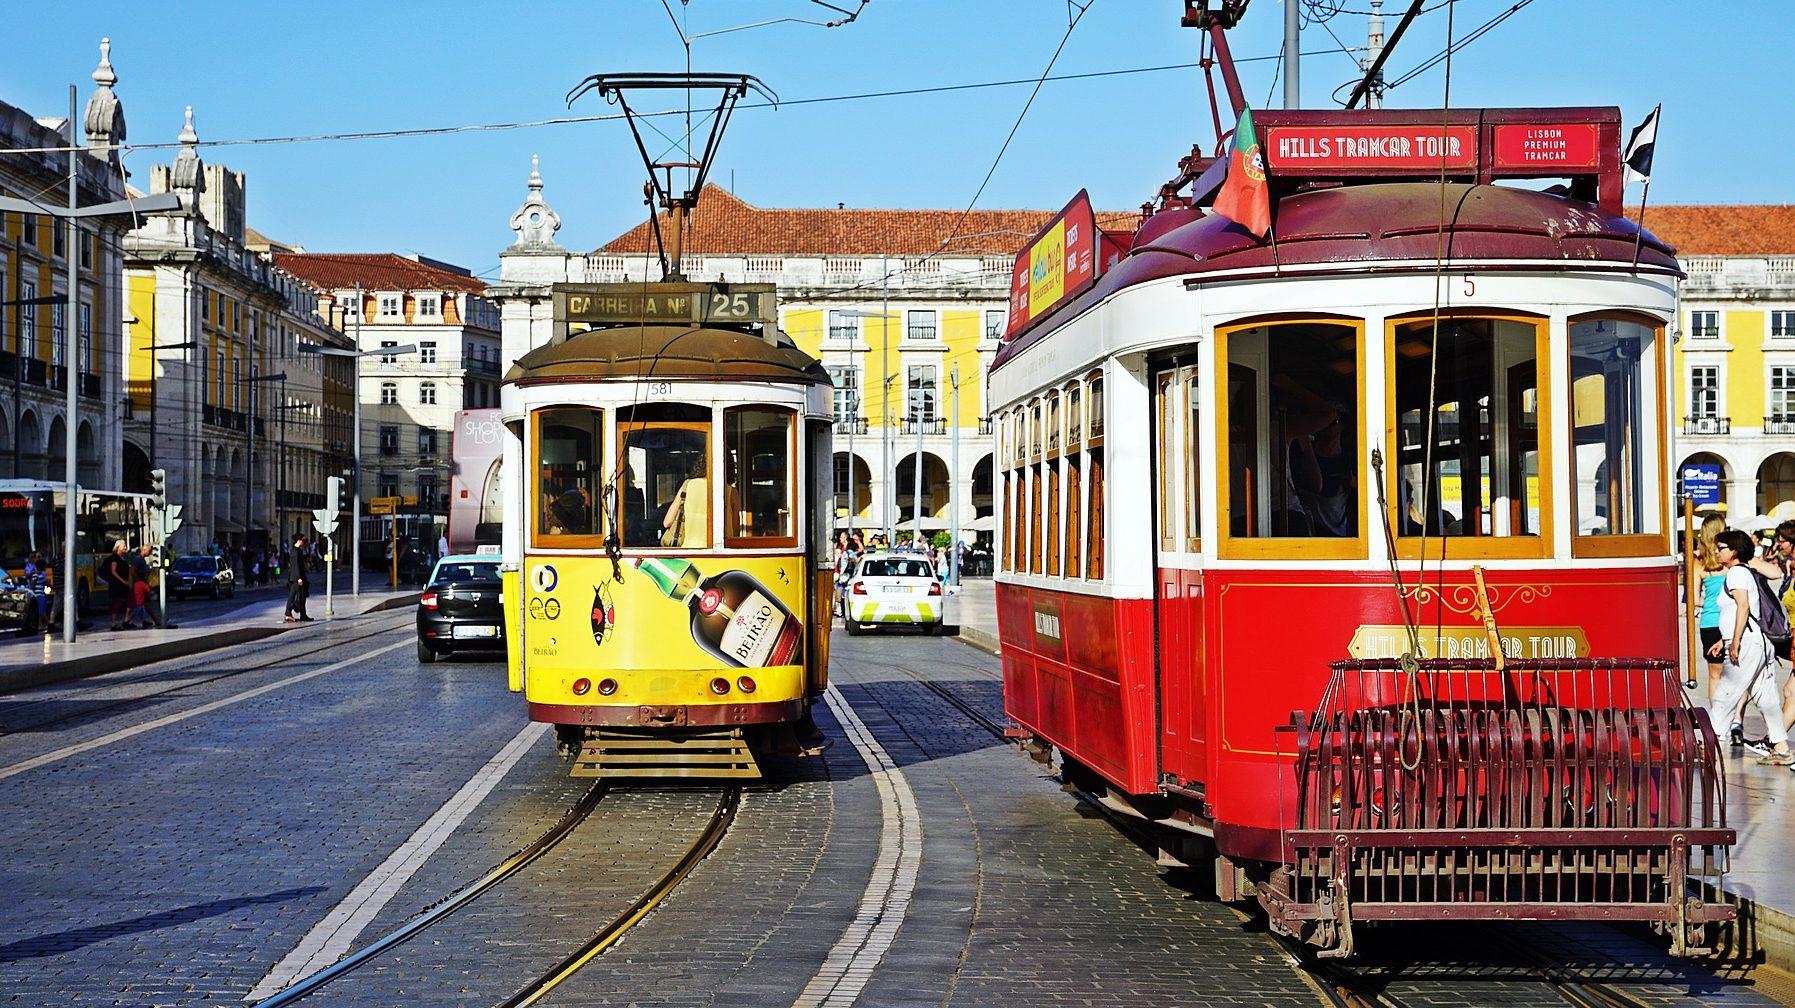 tram-2650096_1920